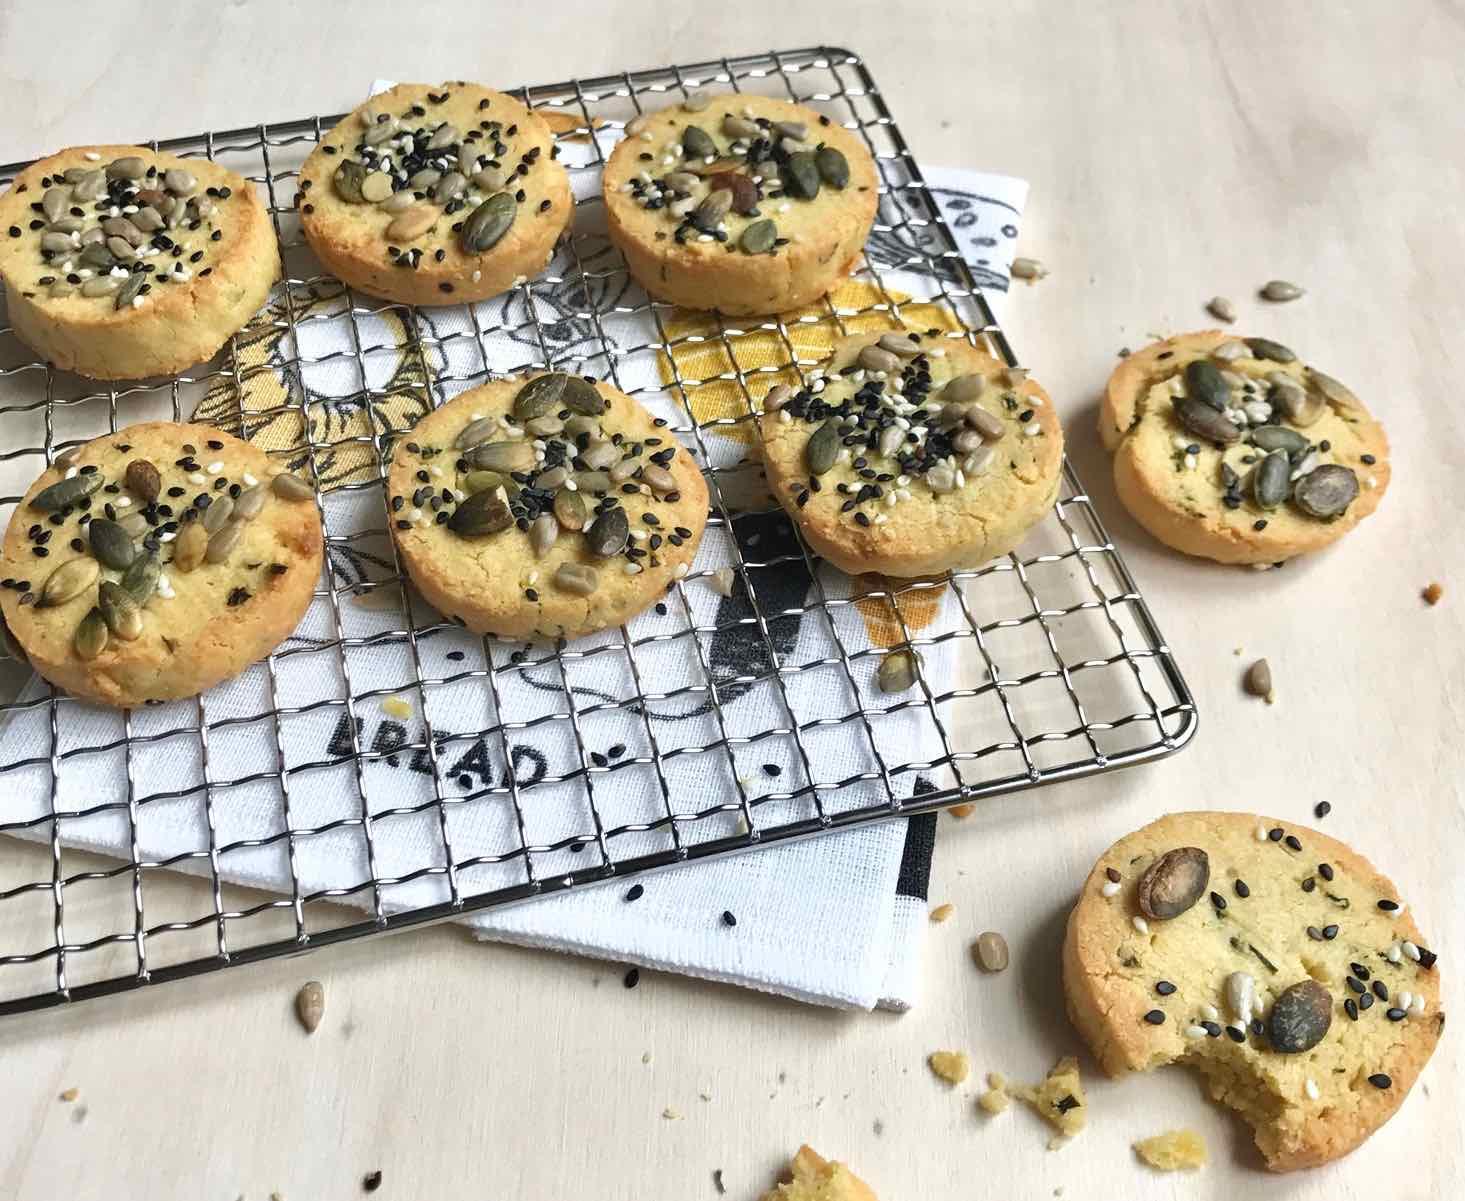 recette rapide de biscuit sal pois chiches amandes. Black Bedroom Furniture Sets. Home Design Ideas